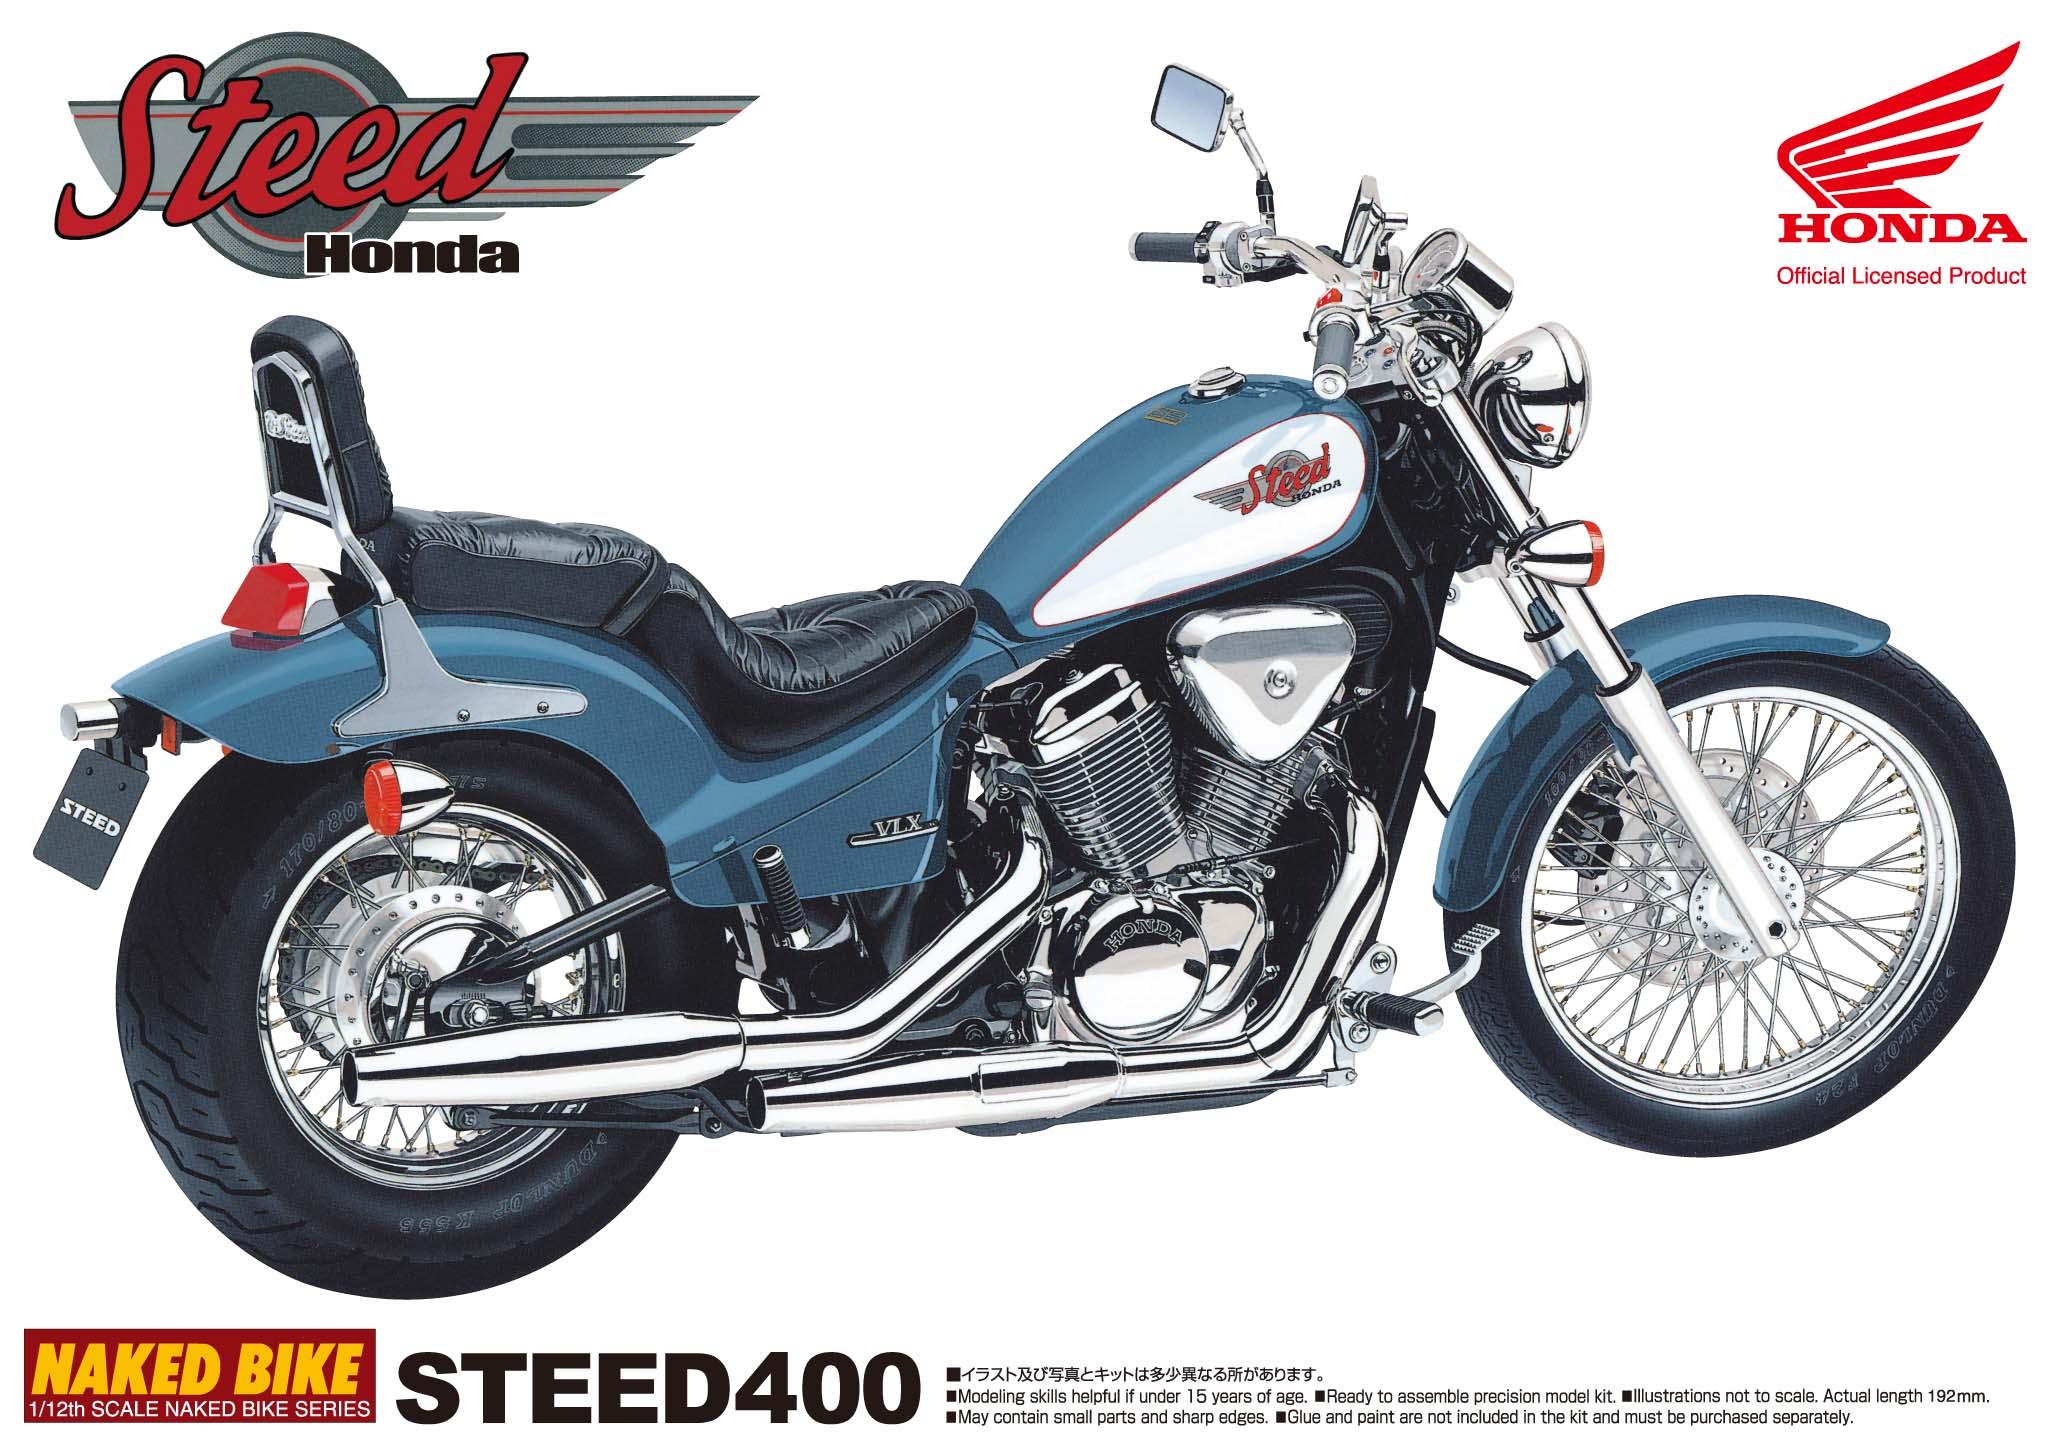 Тест-драйв мотоцикла Honda Steed 400